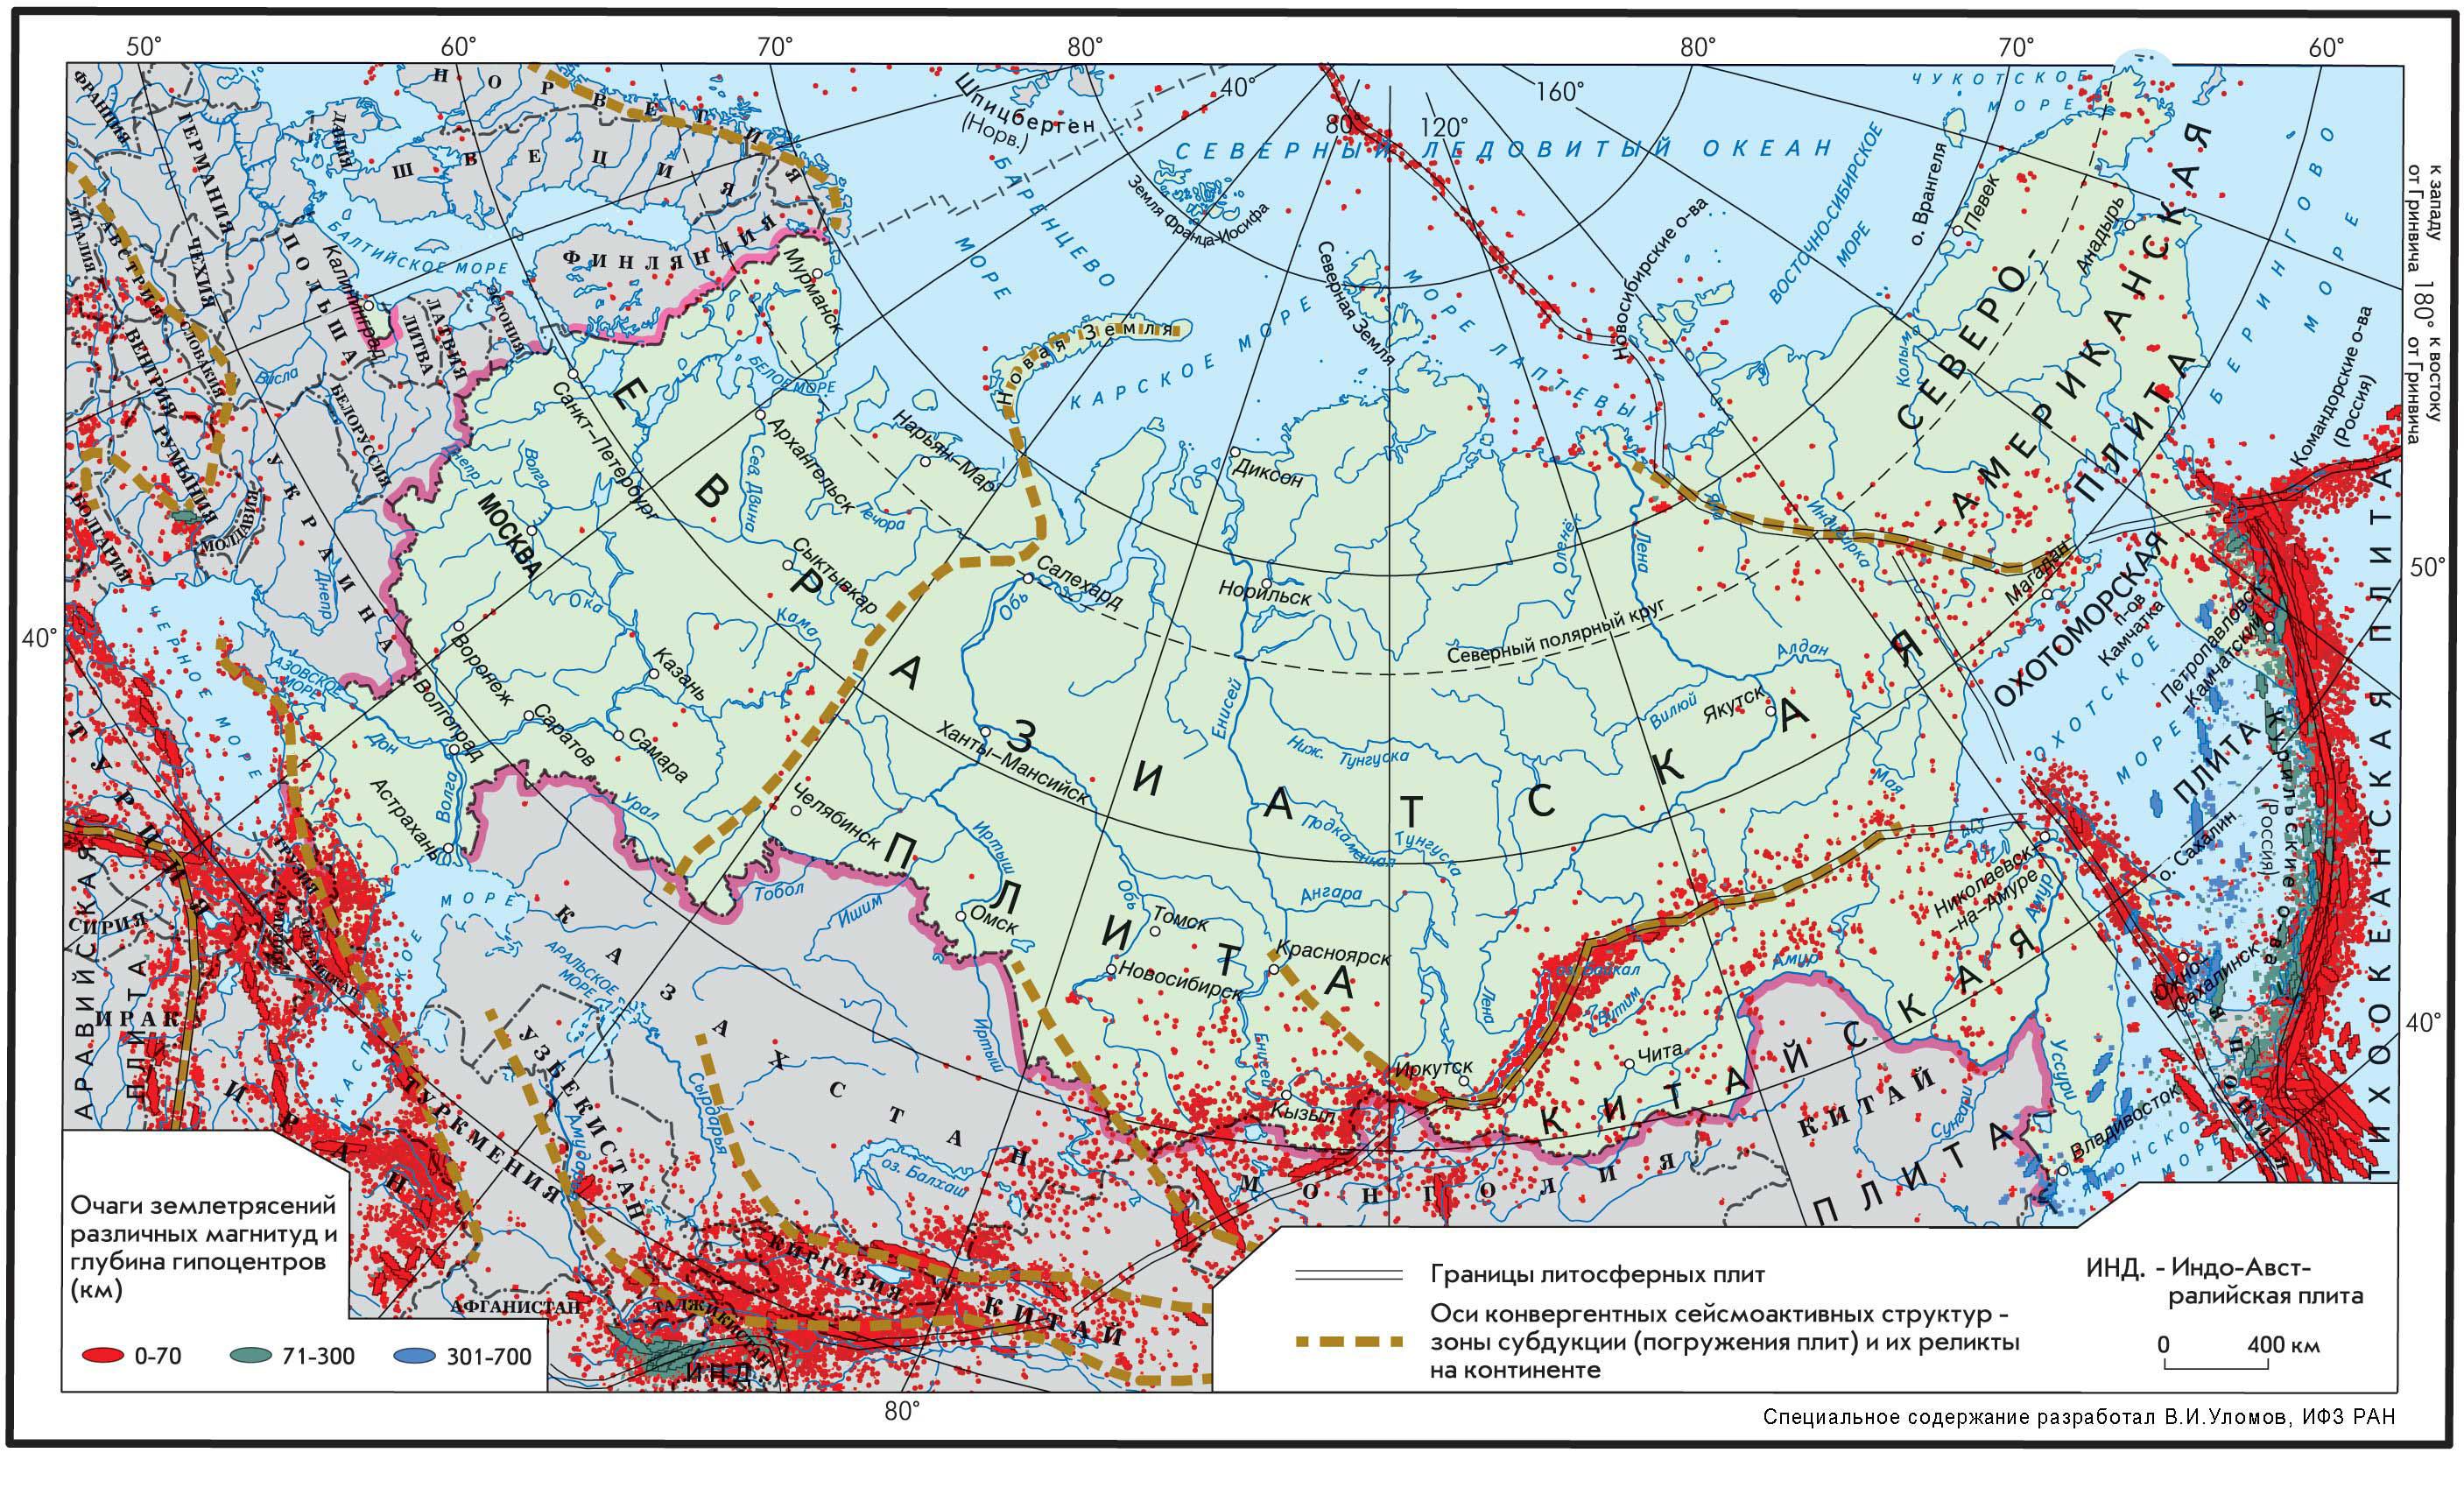 http://seismos-u.ifz.ru/personal/bigpictures/seismic-nea.jpg